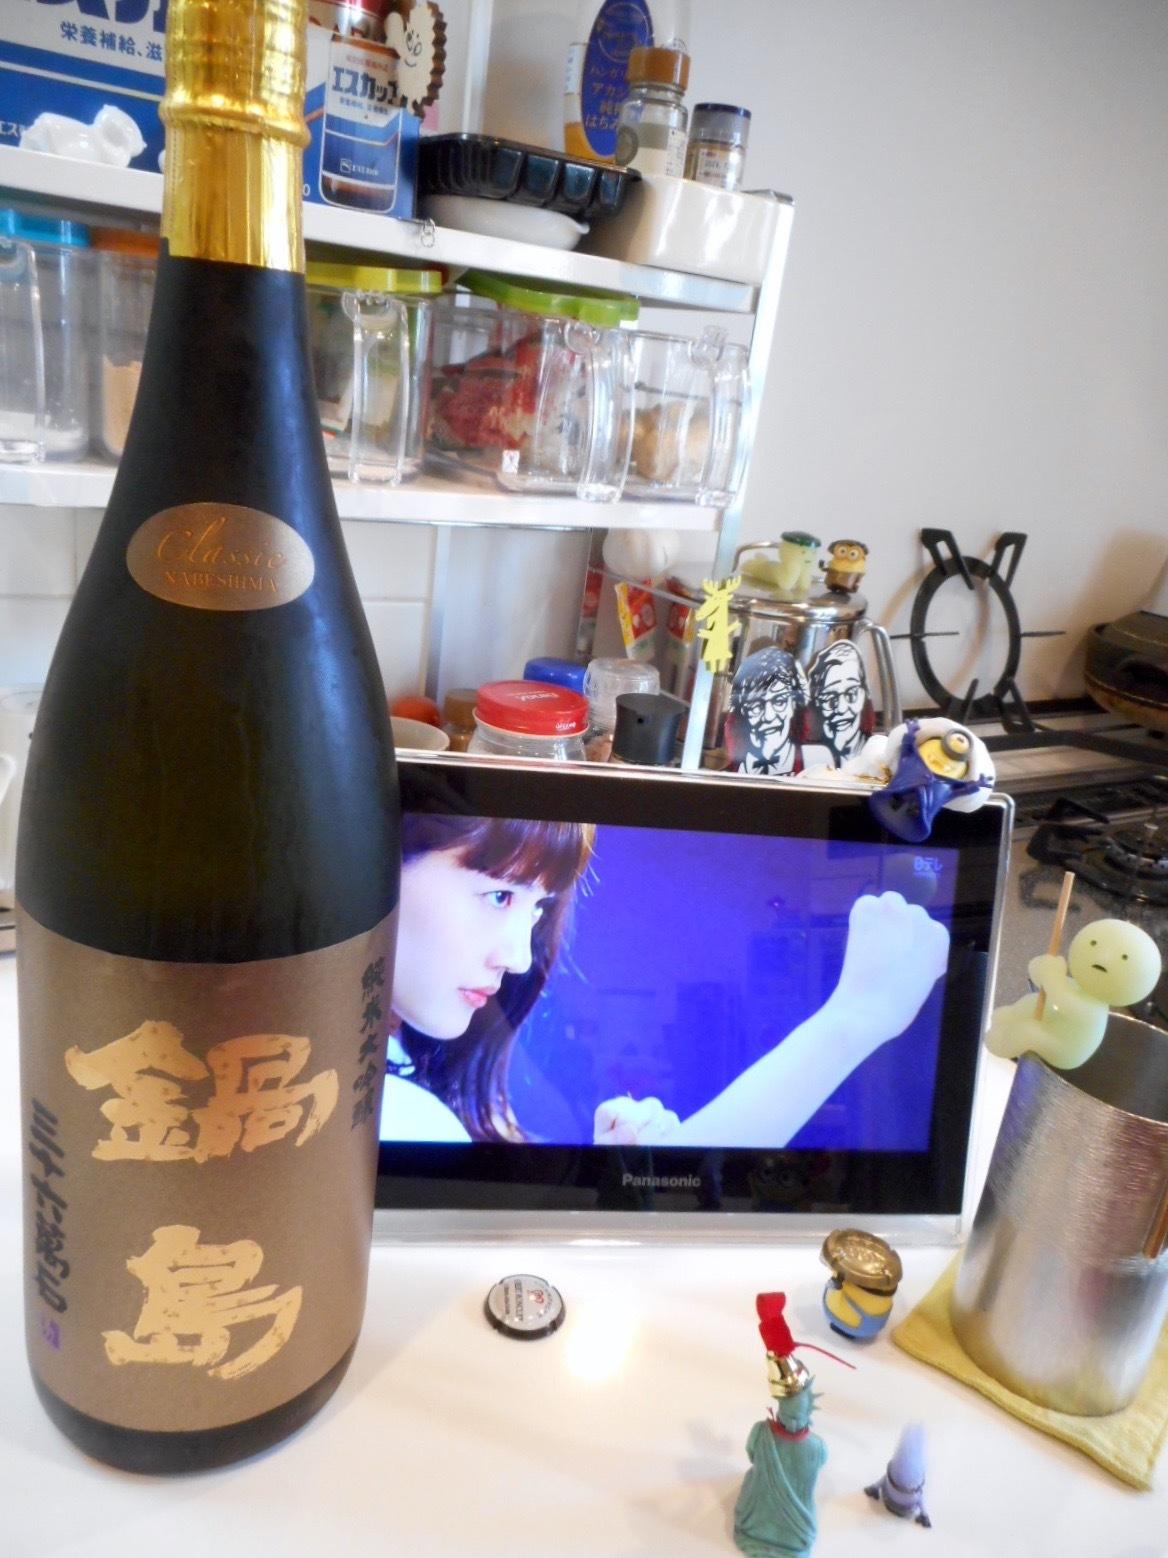 nabeshima_jundai_yoshikawa28by3.jpg